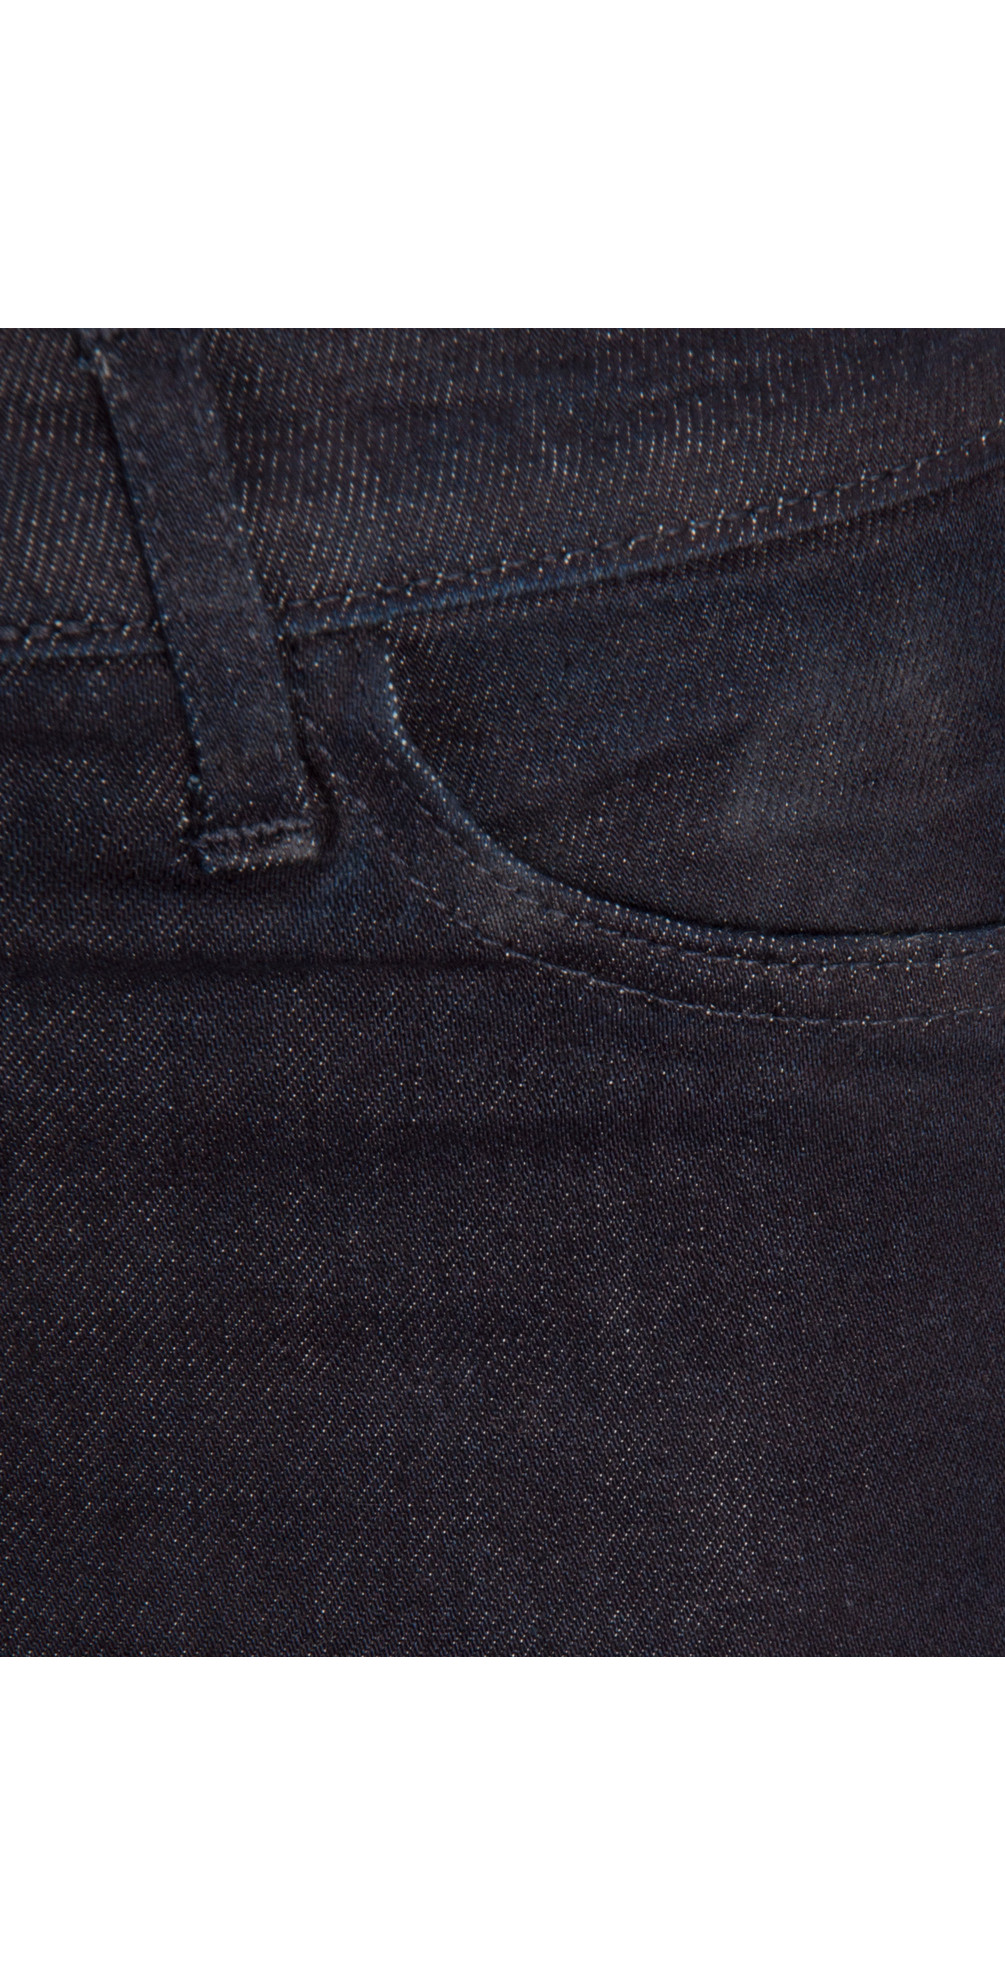 Venus 12 Mid Rise Ankle Jean main image